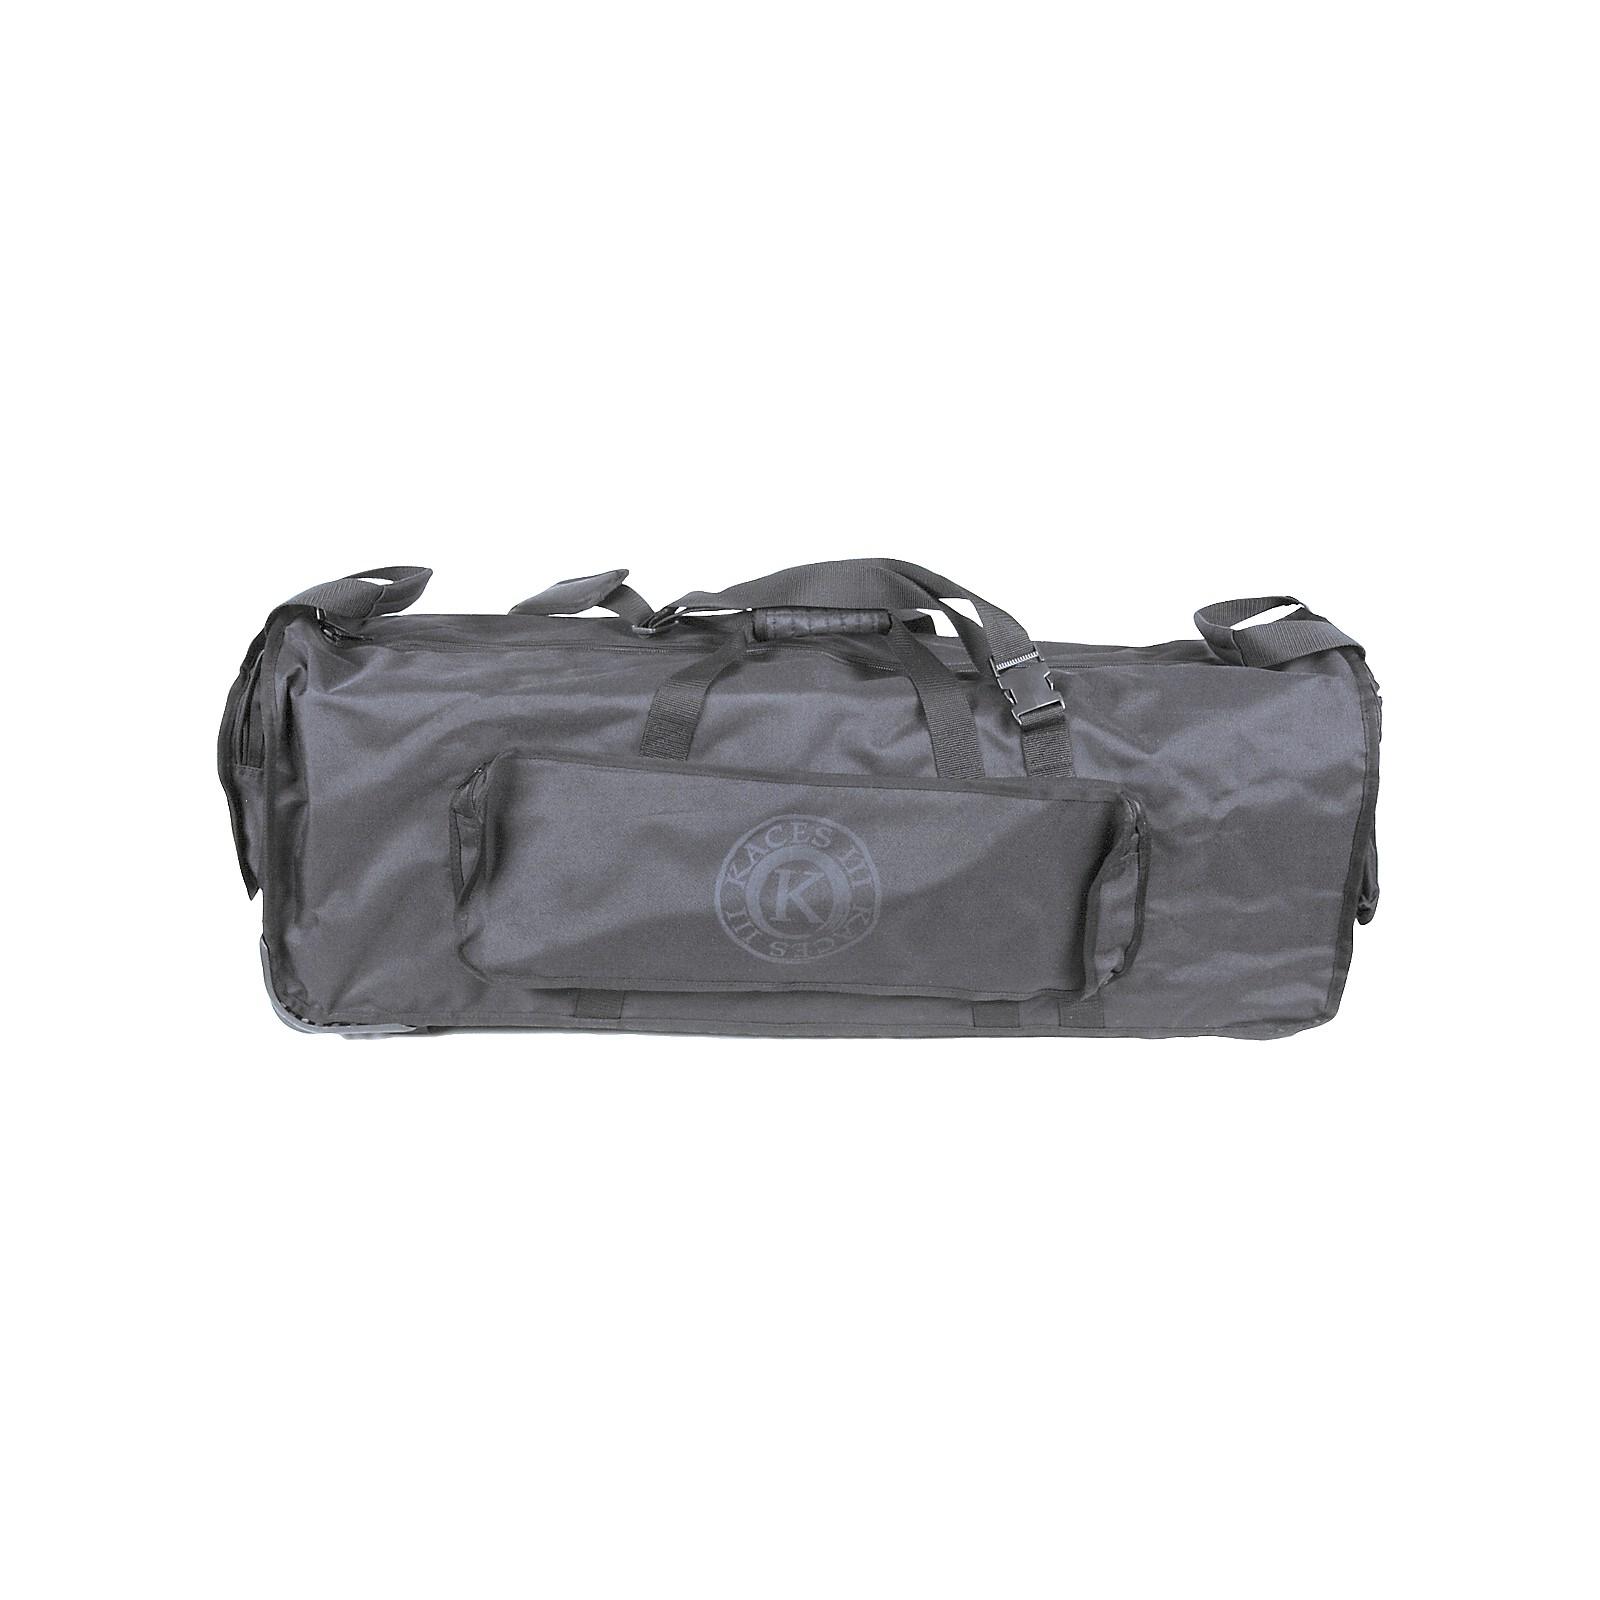 Kaces Drum Hardware Bag with Wheels